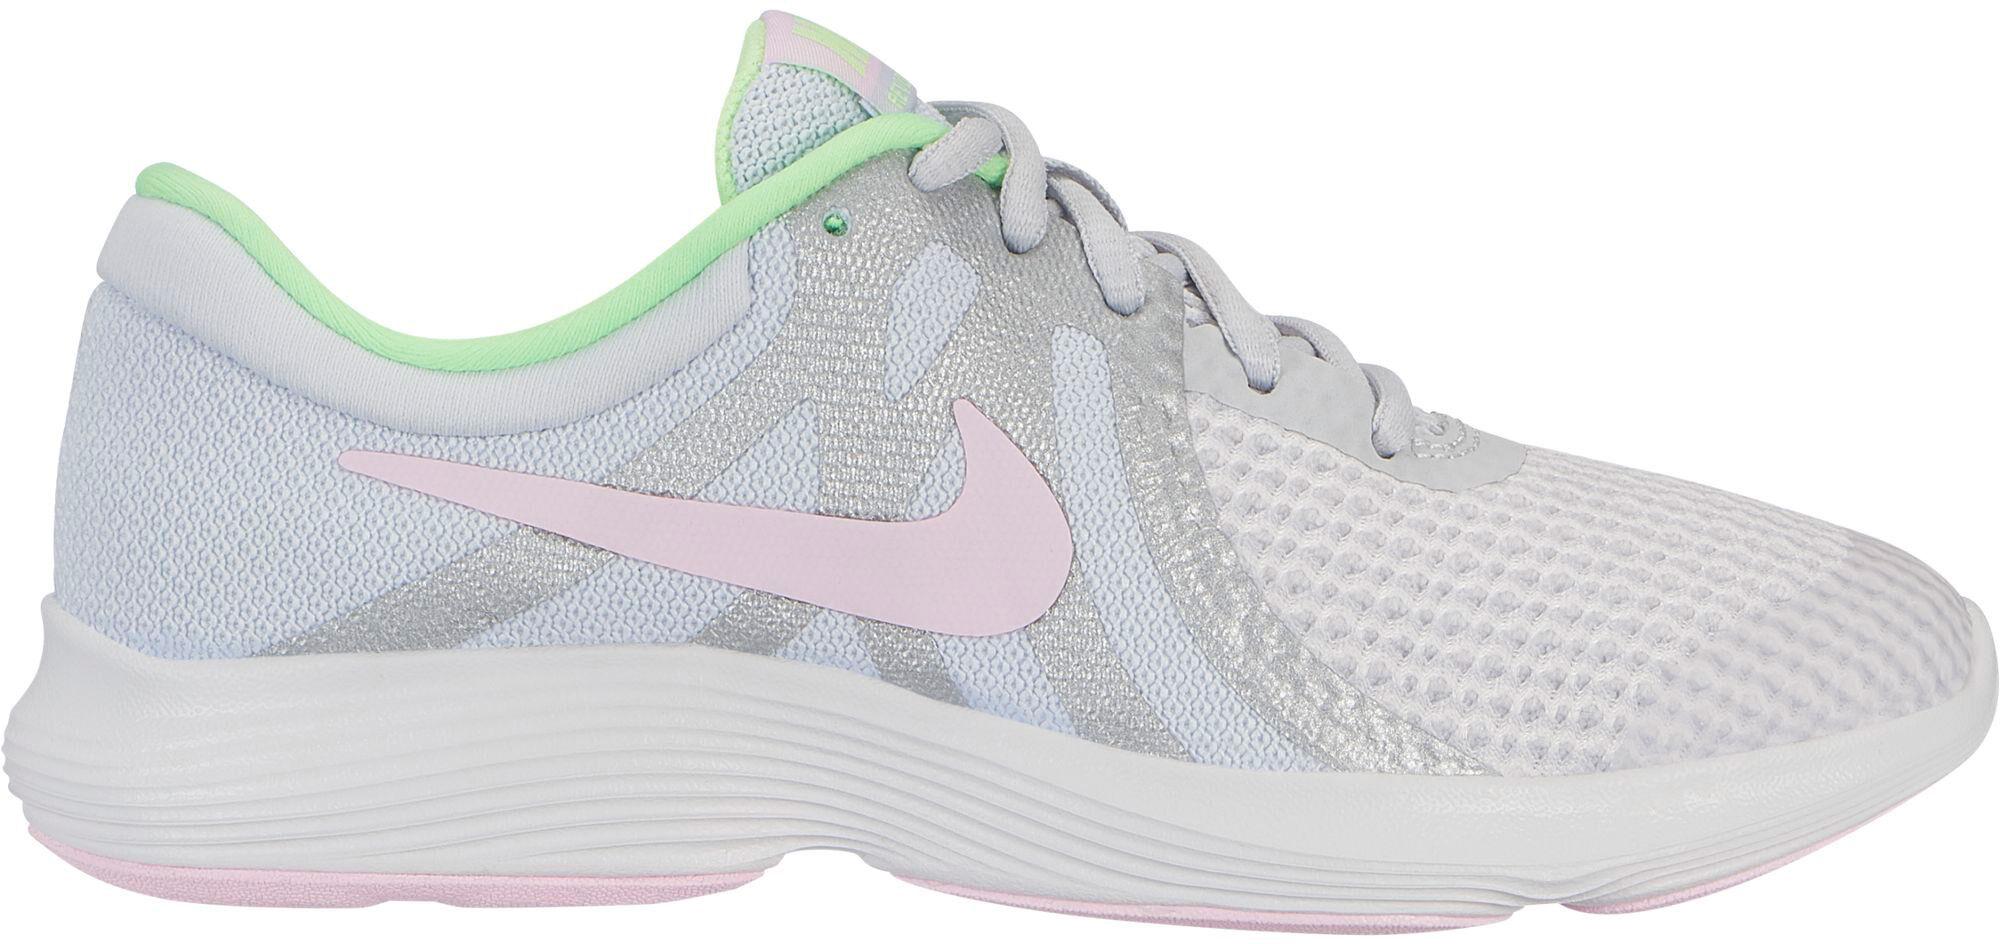 De Para Zapatillas Ofertas 37 Baratas Running Nike Talla Outlet 2IYWEbD9eH